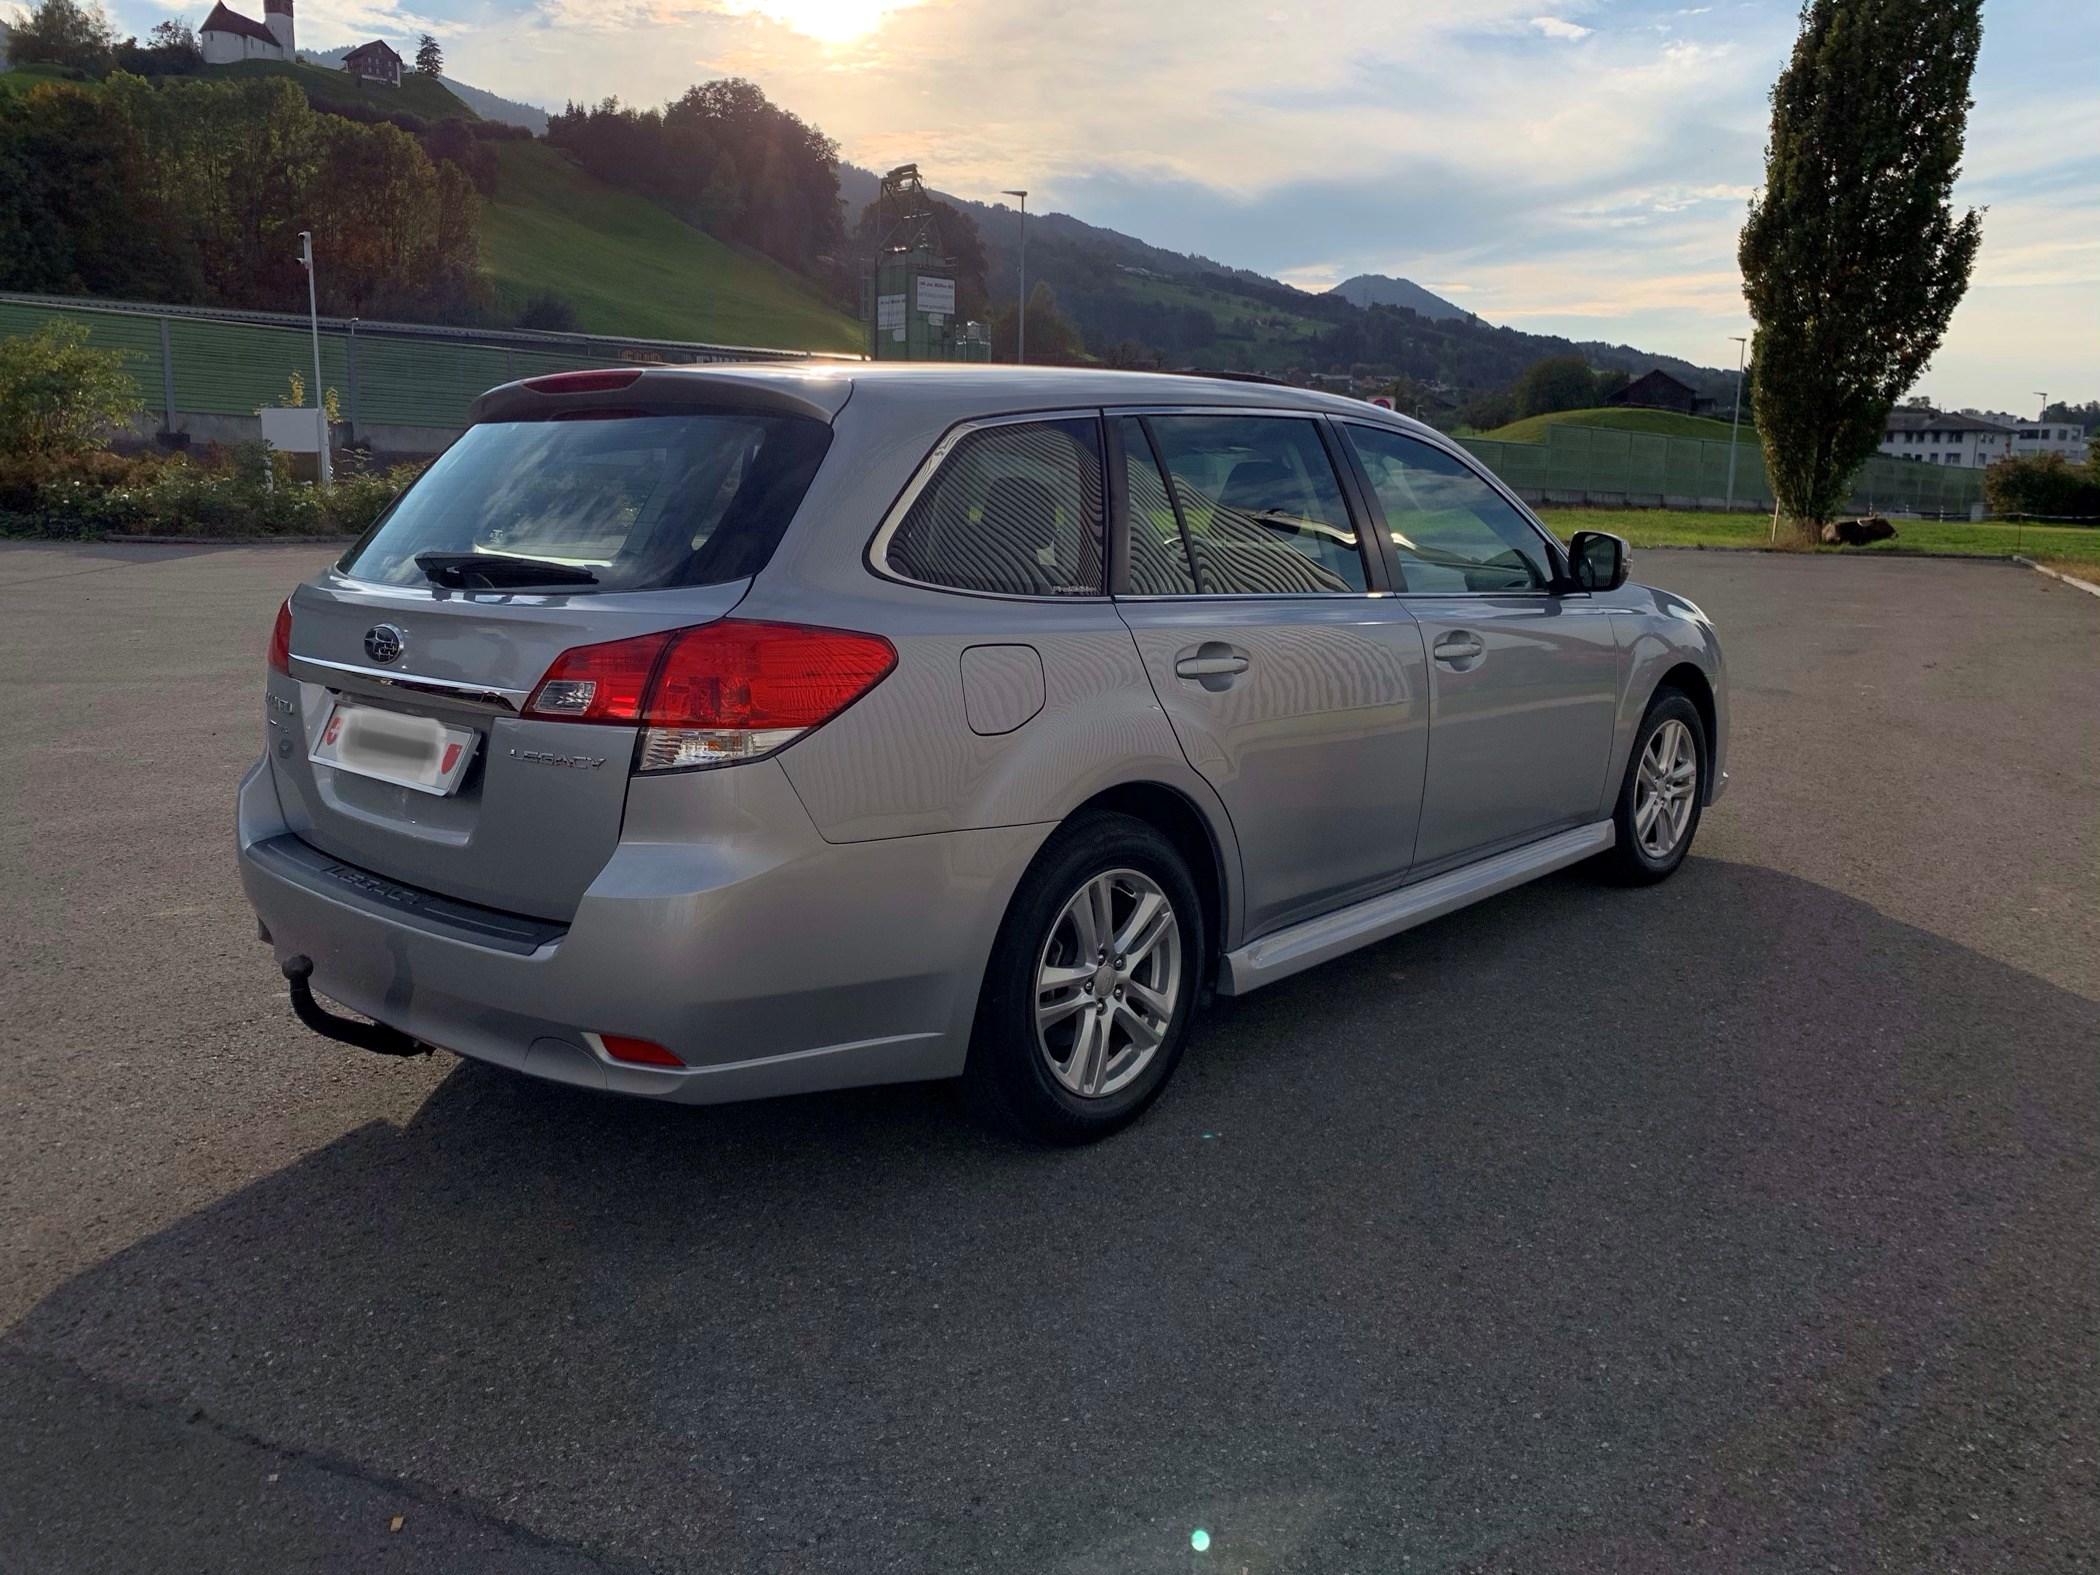 Subaru Legacy Station 2.0i Final Edition